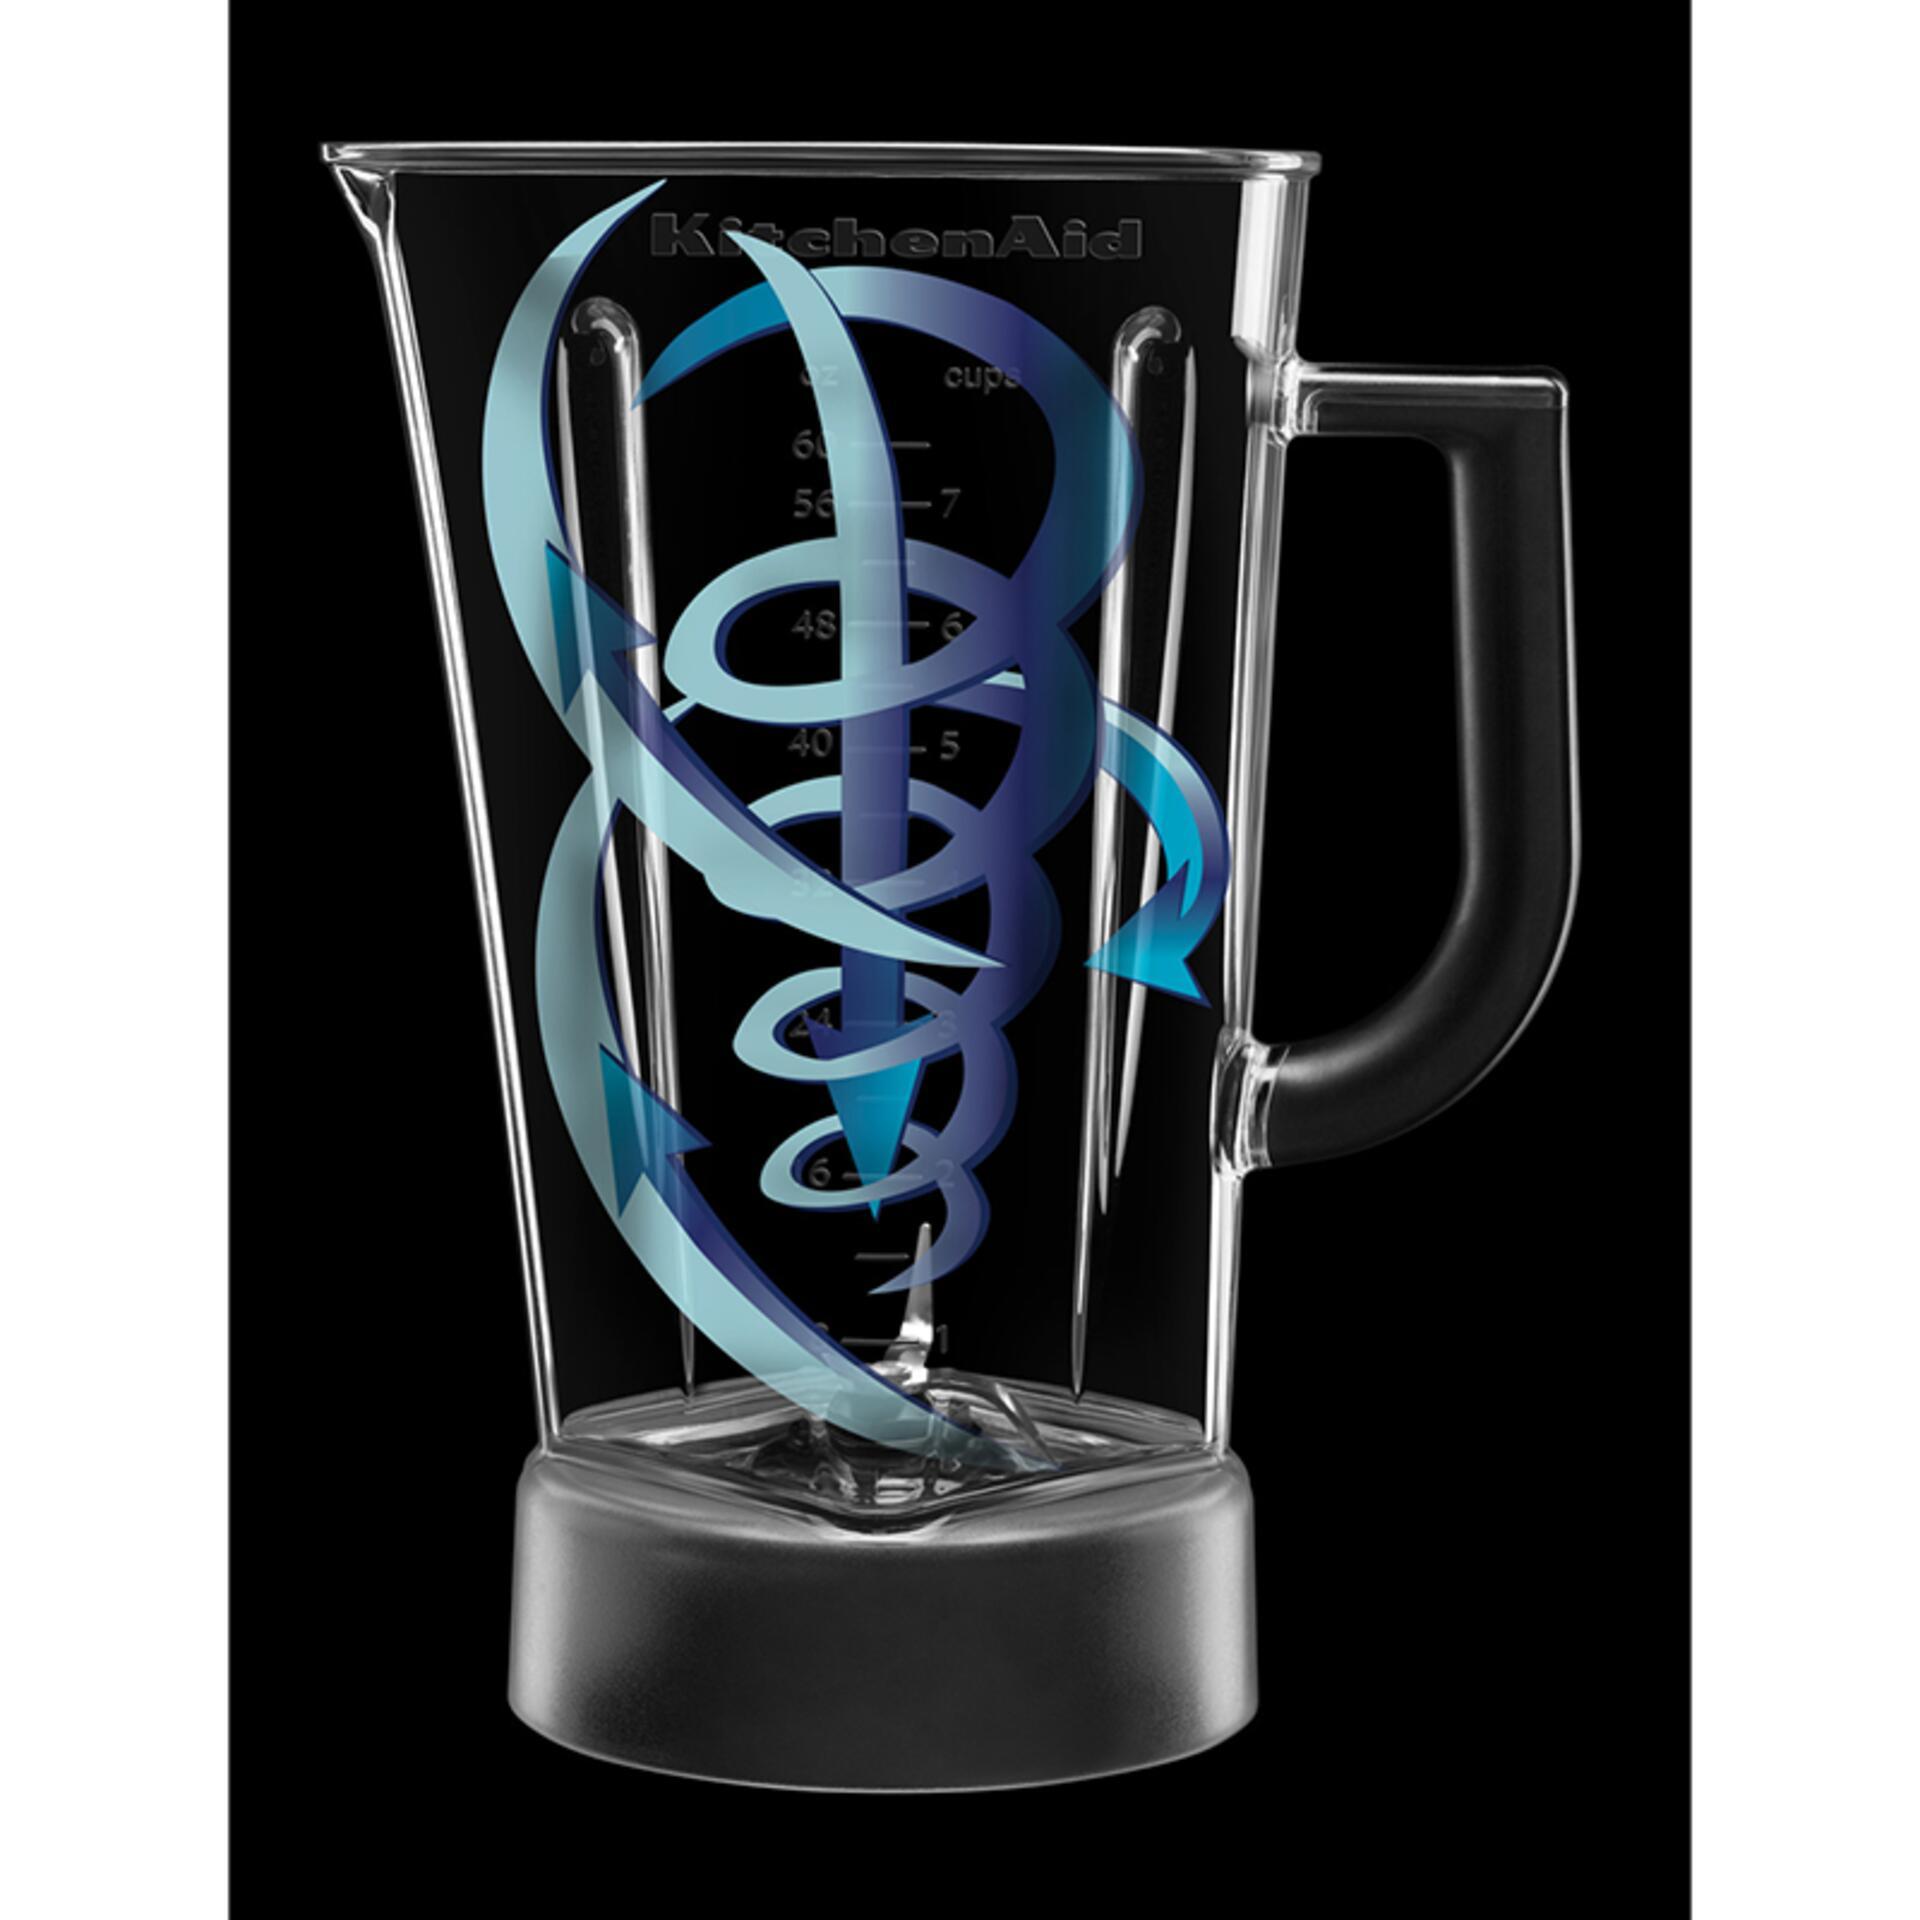 Kitchenaid Blender im Rautendesign Classic Silber 5KSB1585ECU